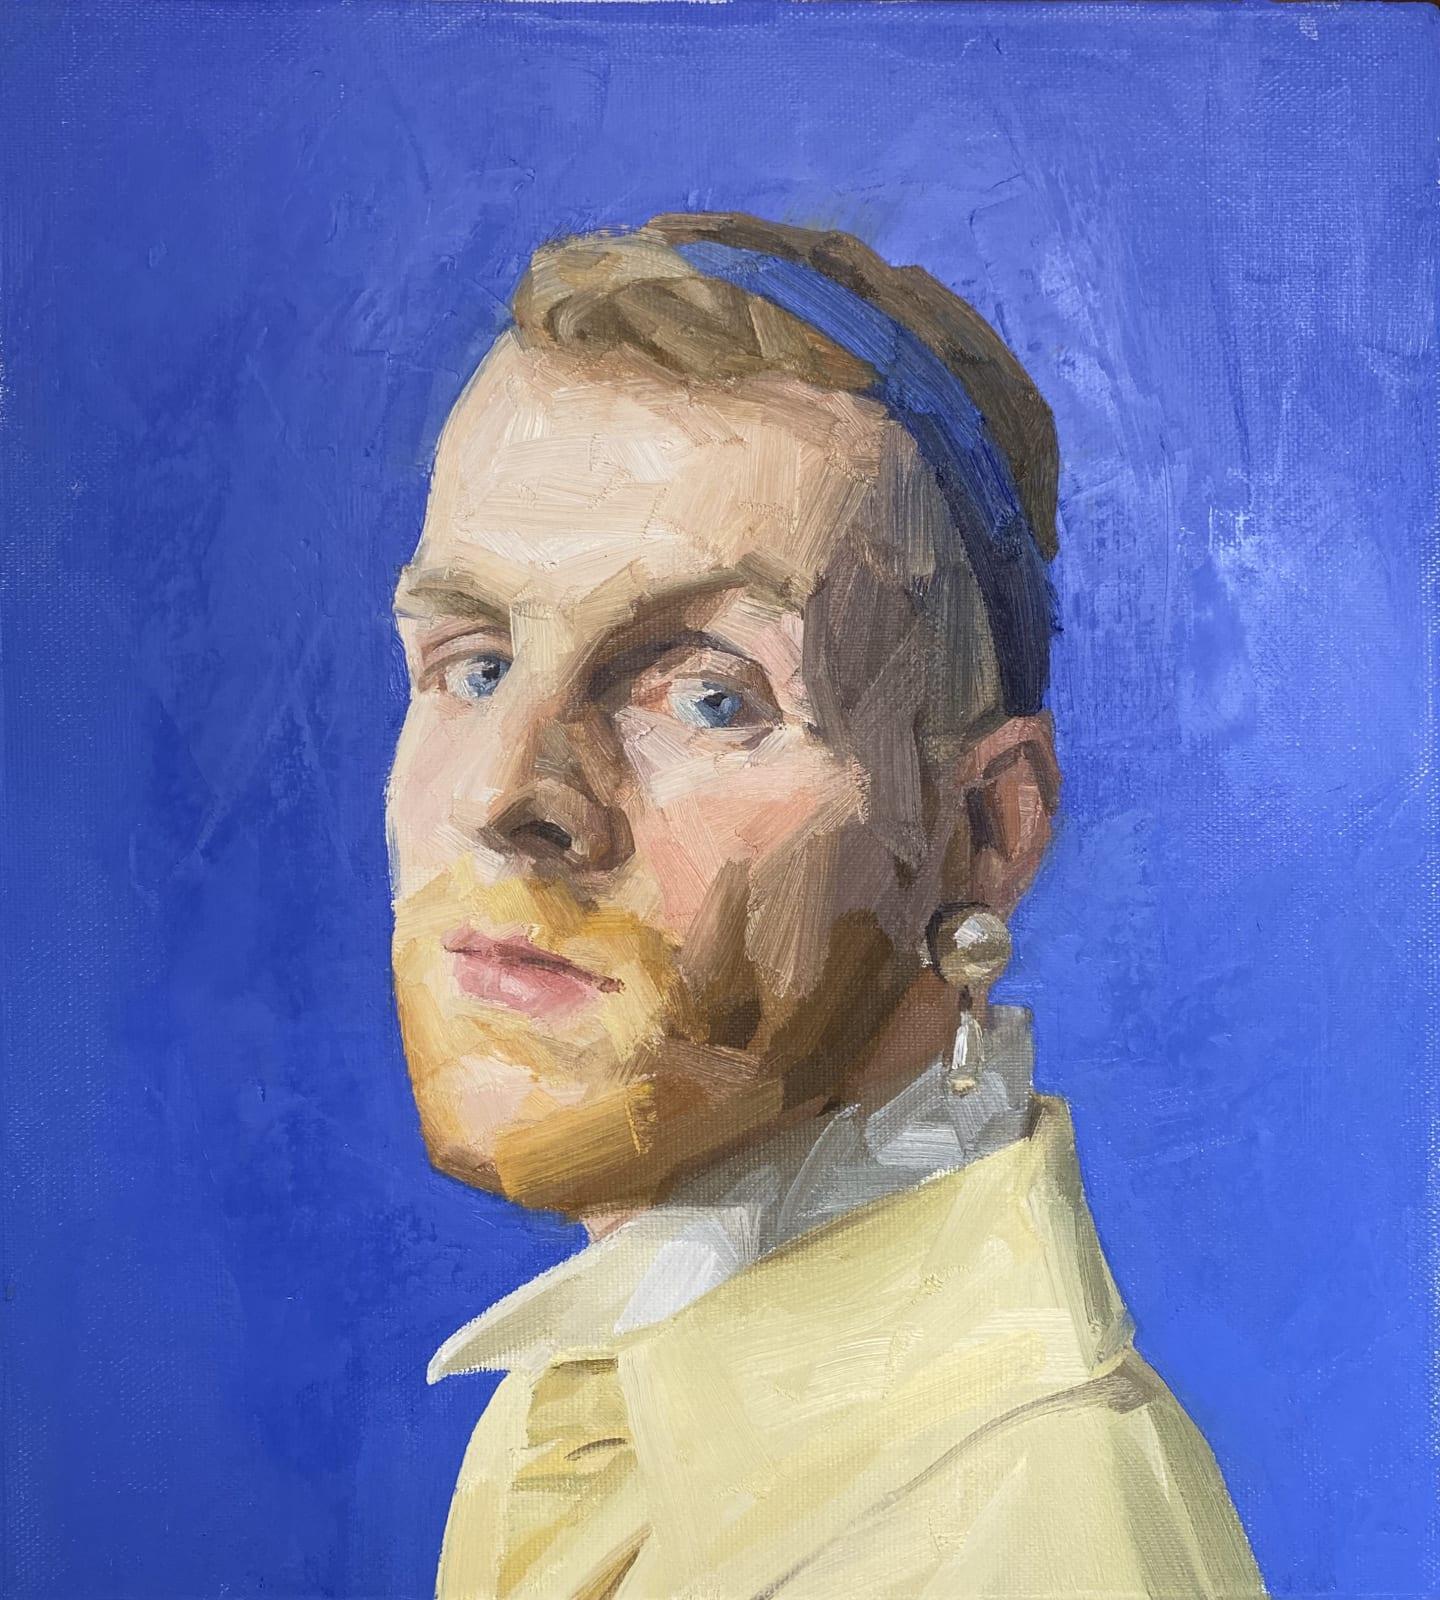 Robert Ware, Self Portrait with Pearl earring